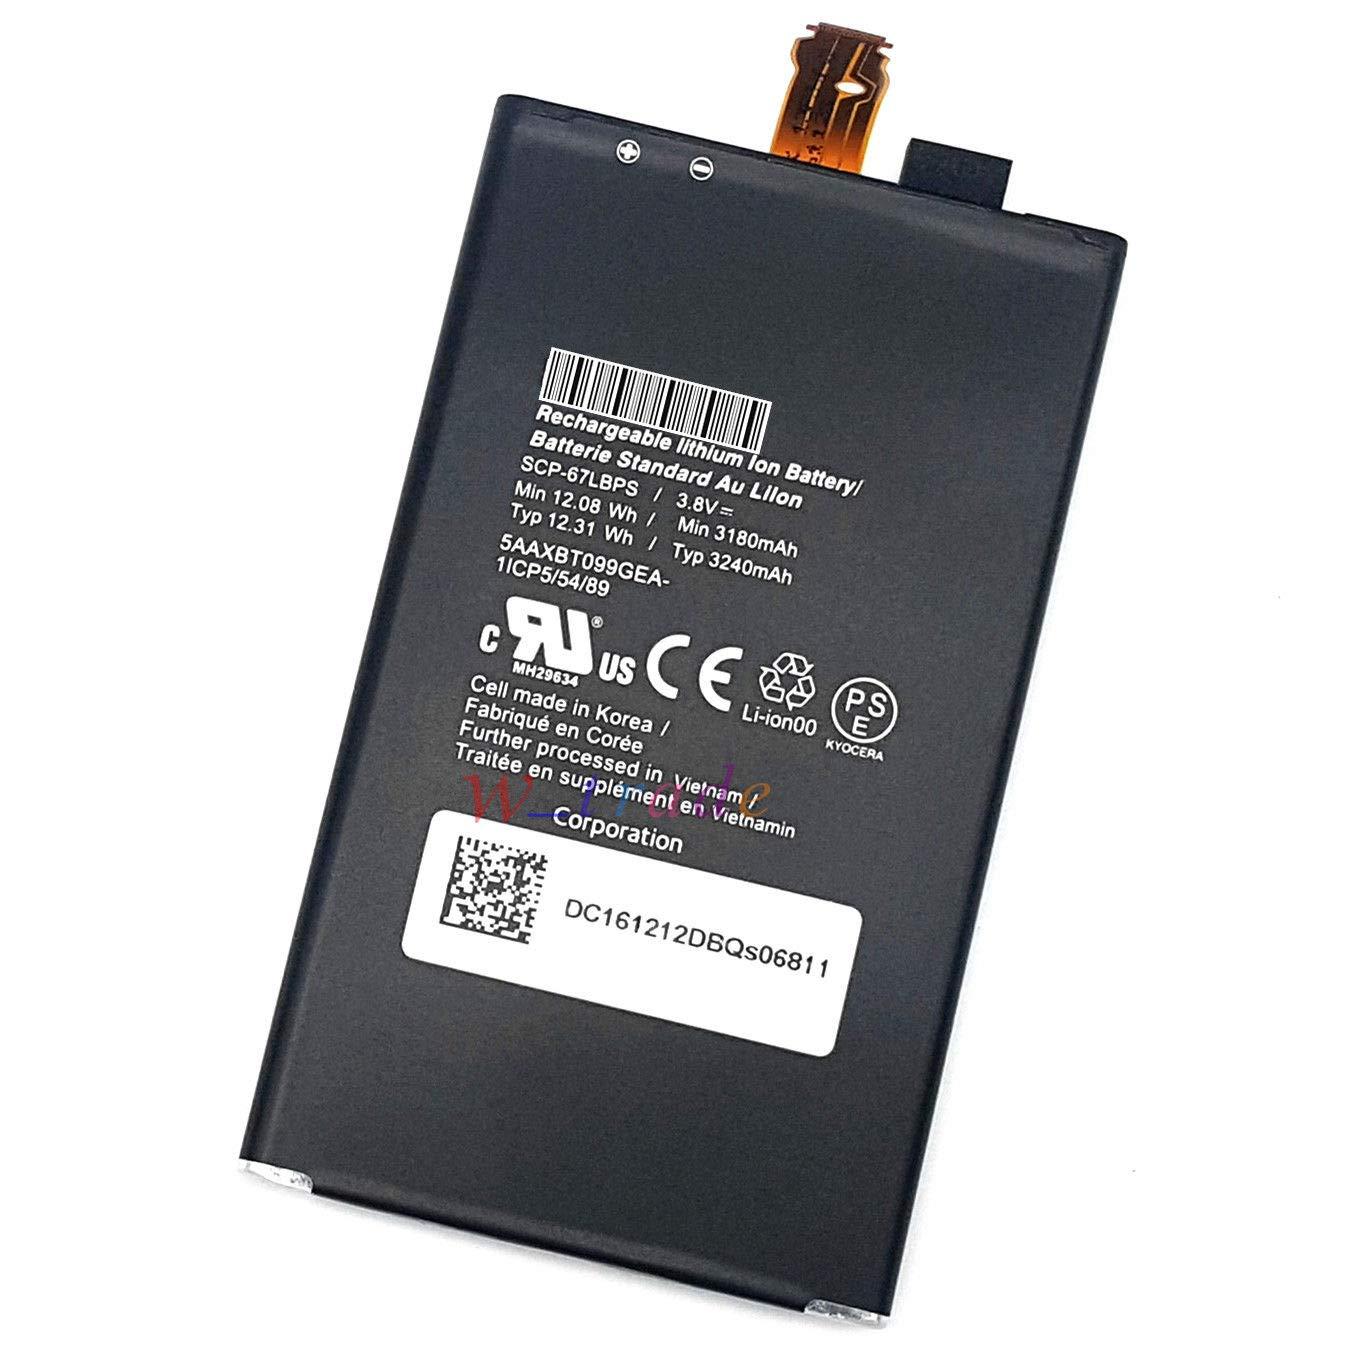 FidgetFidget OEM New Battery for Kyocera Duraforce PRO E6820 E6810 SCP-67LBPS 3240mAh 3.8V